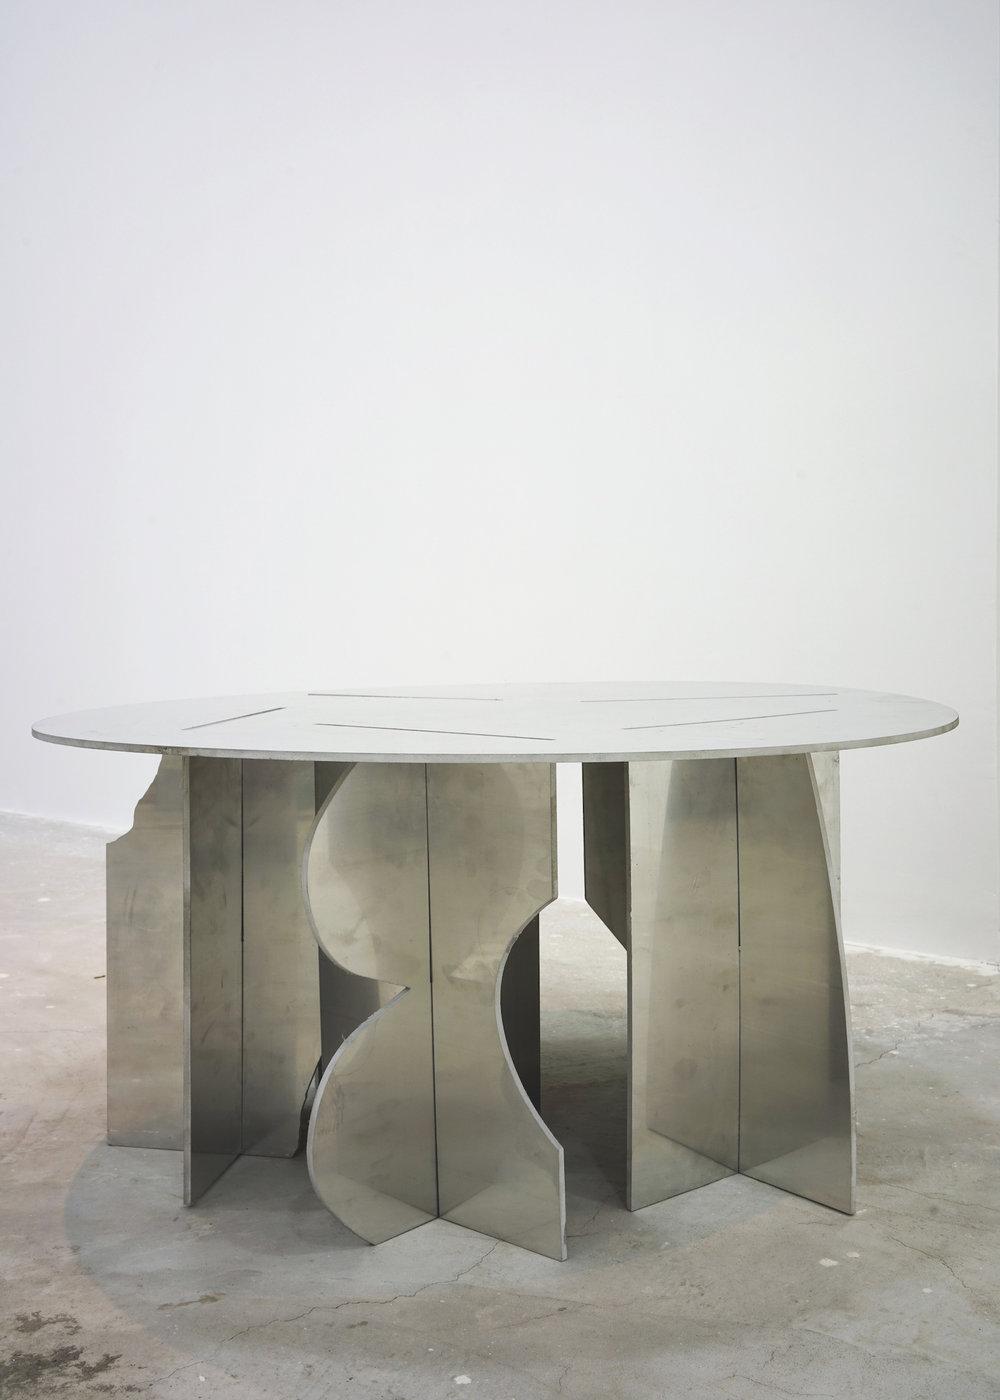 NOMAD St.Moritz_Etage Projects Copenhagen_Coffee Table #01_Bahraini Danish_ph.courtesy Etage Projects Copenhagen.jpg